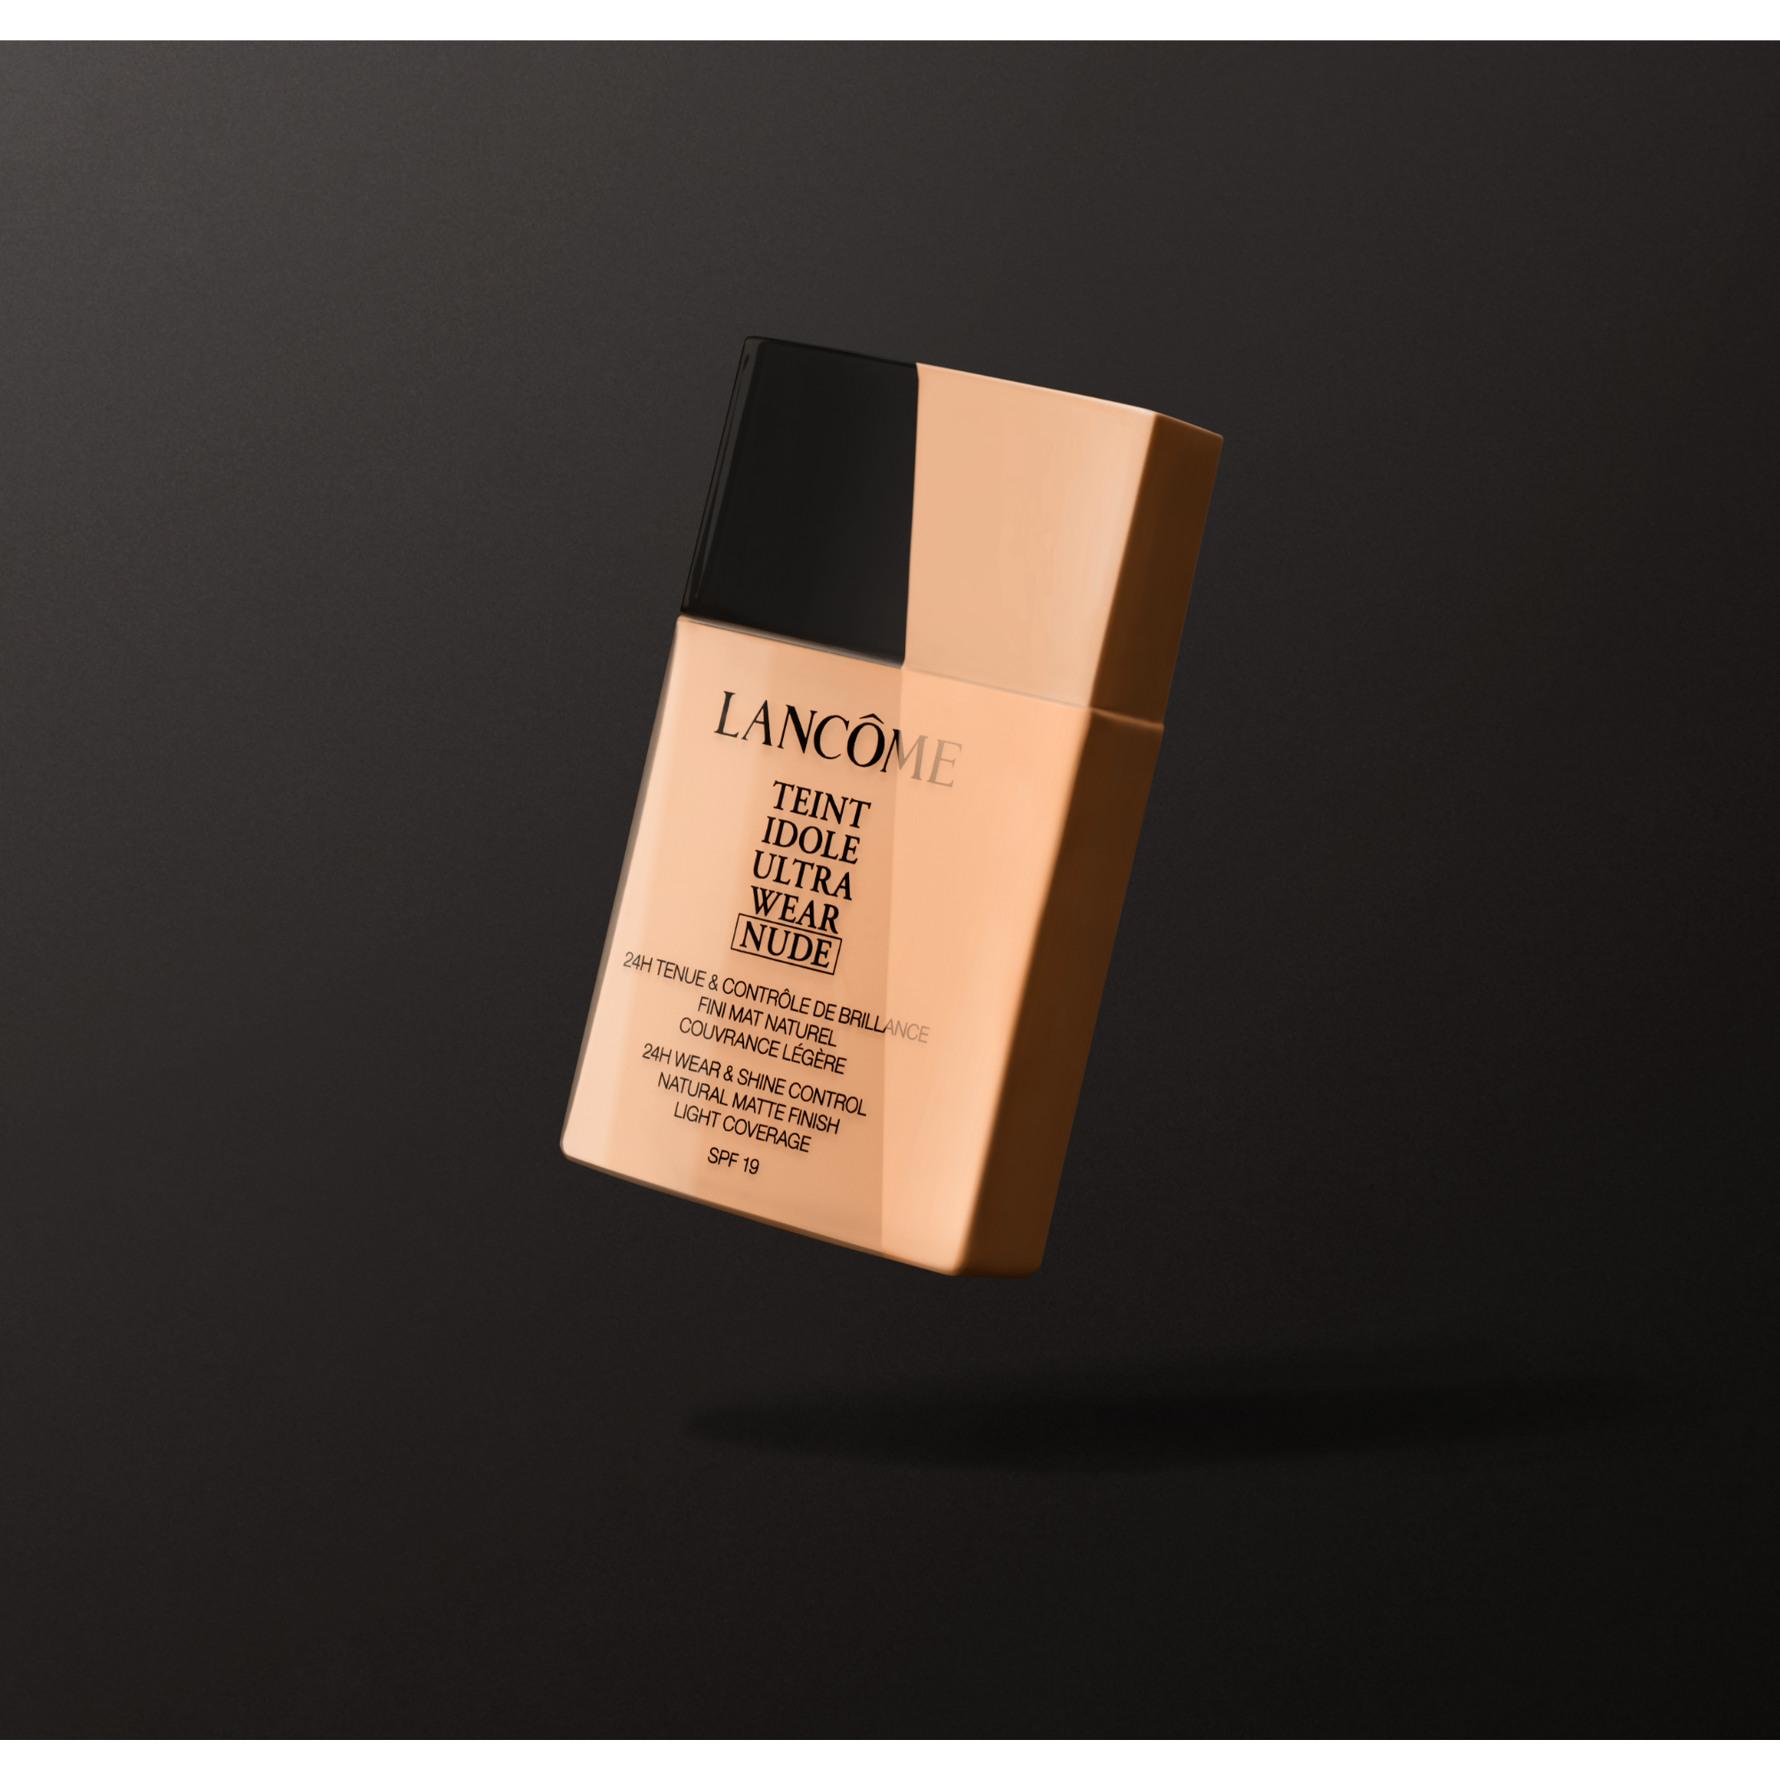 Lancôme Teint Idole Ultra Wear Nude SPF19 #07 Sable